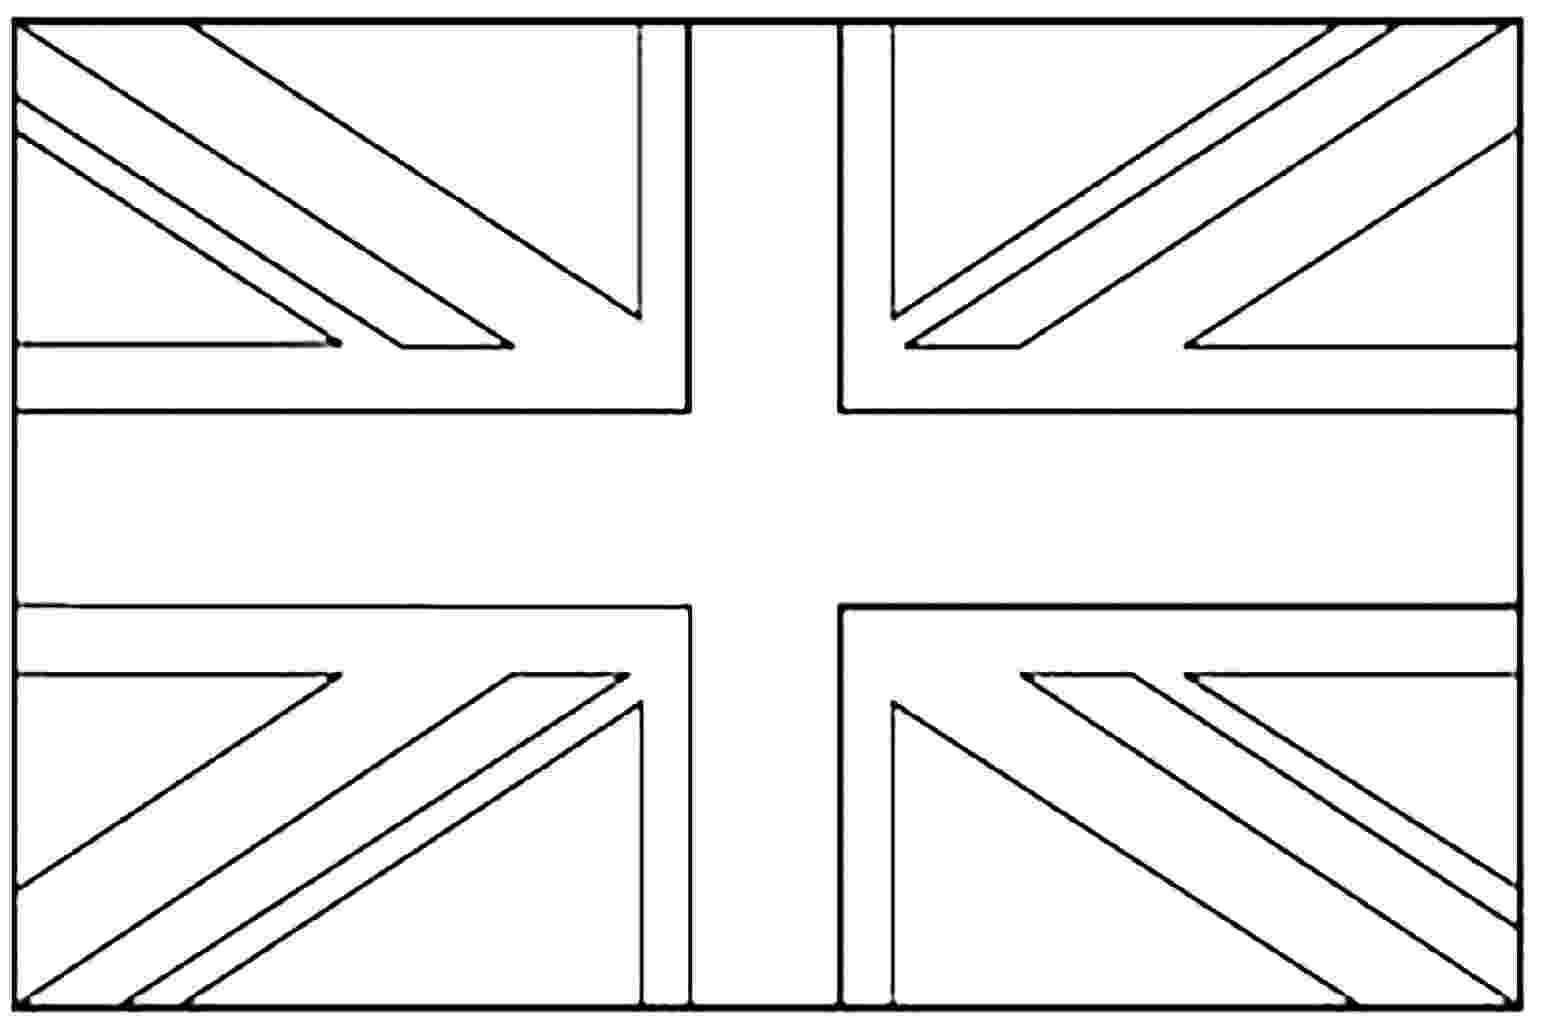 colouring pages union jack flag british flag coloring page union jack coloring page free pages colouring jack union flag